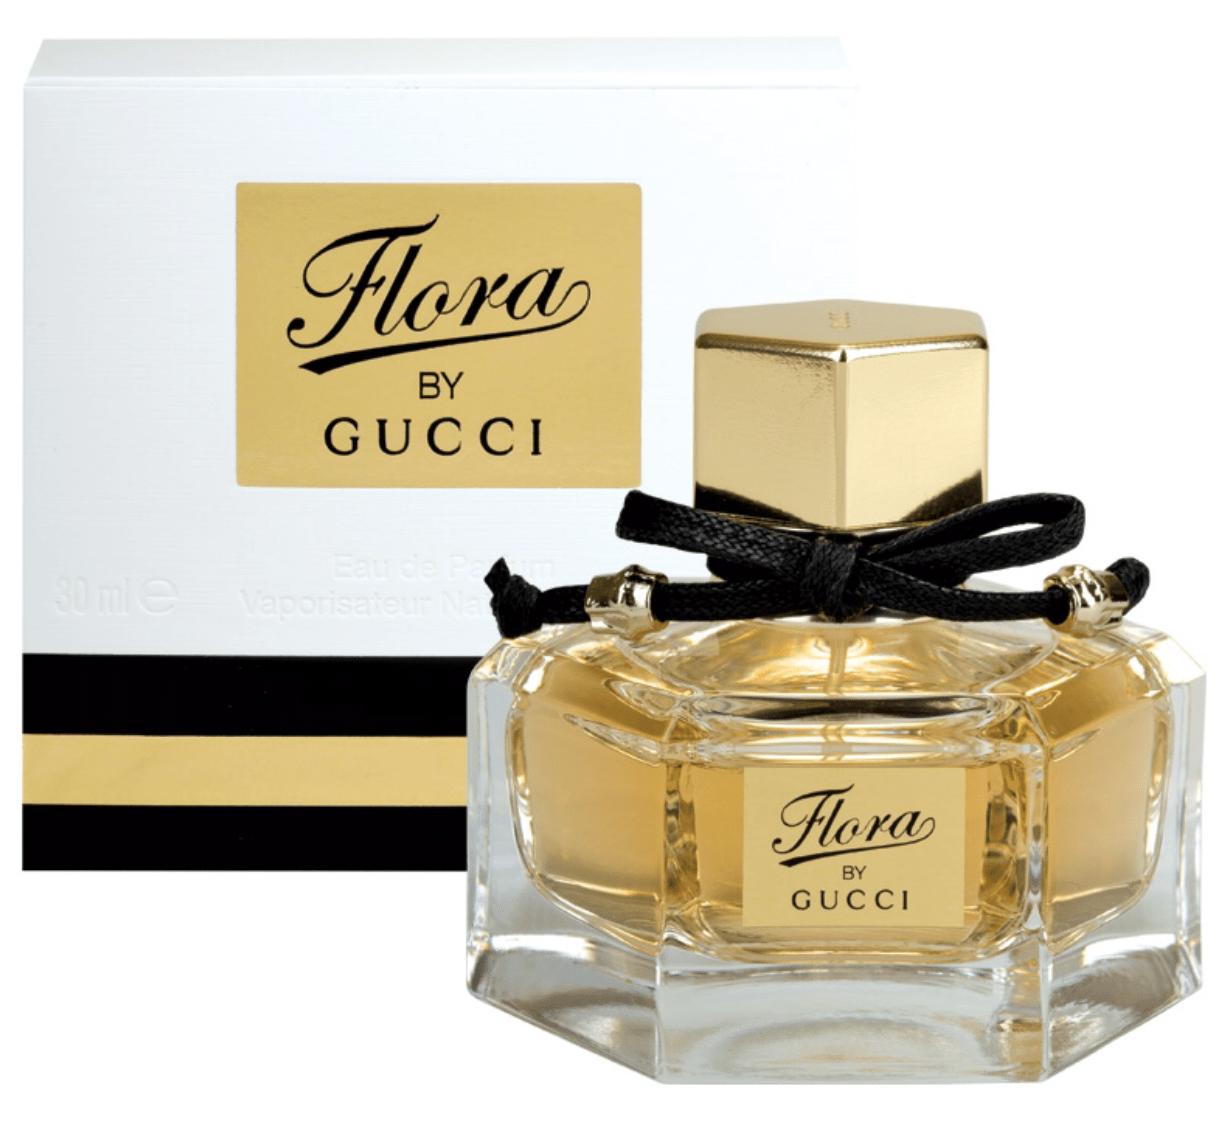 94230f6d4 GUCCI FLORA WOMEN EDP 75 ML - Perfume for Bangladesh